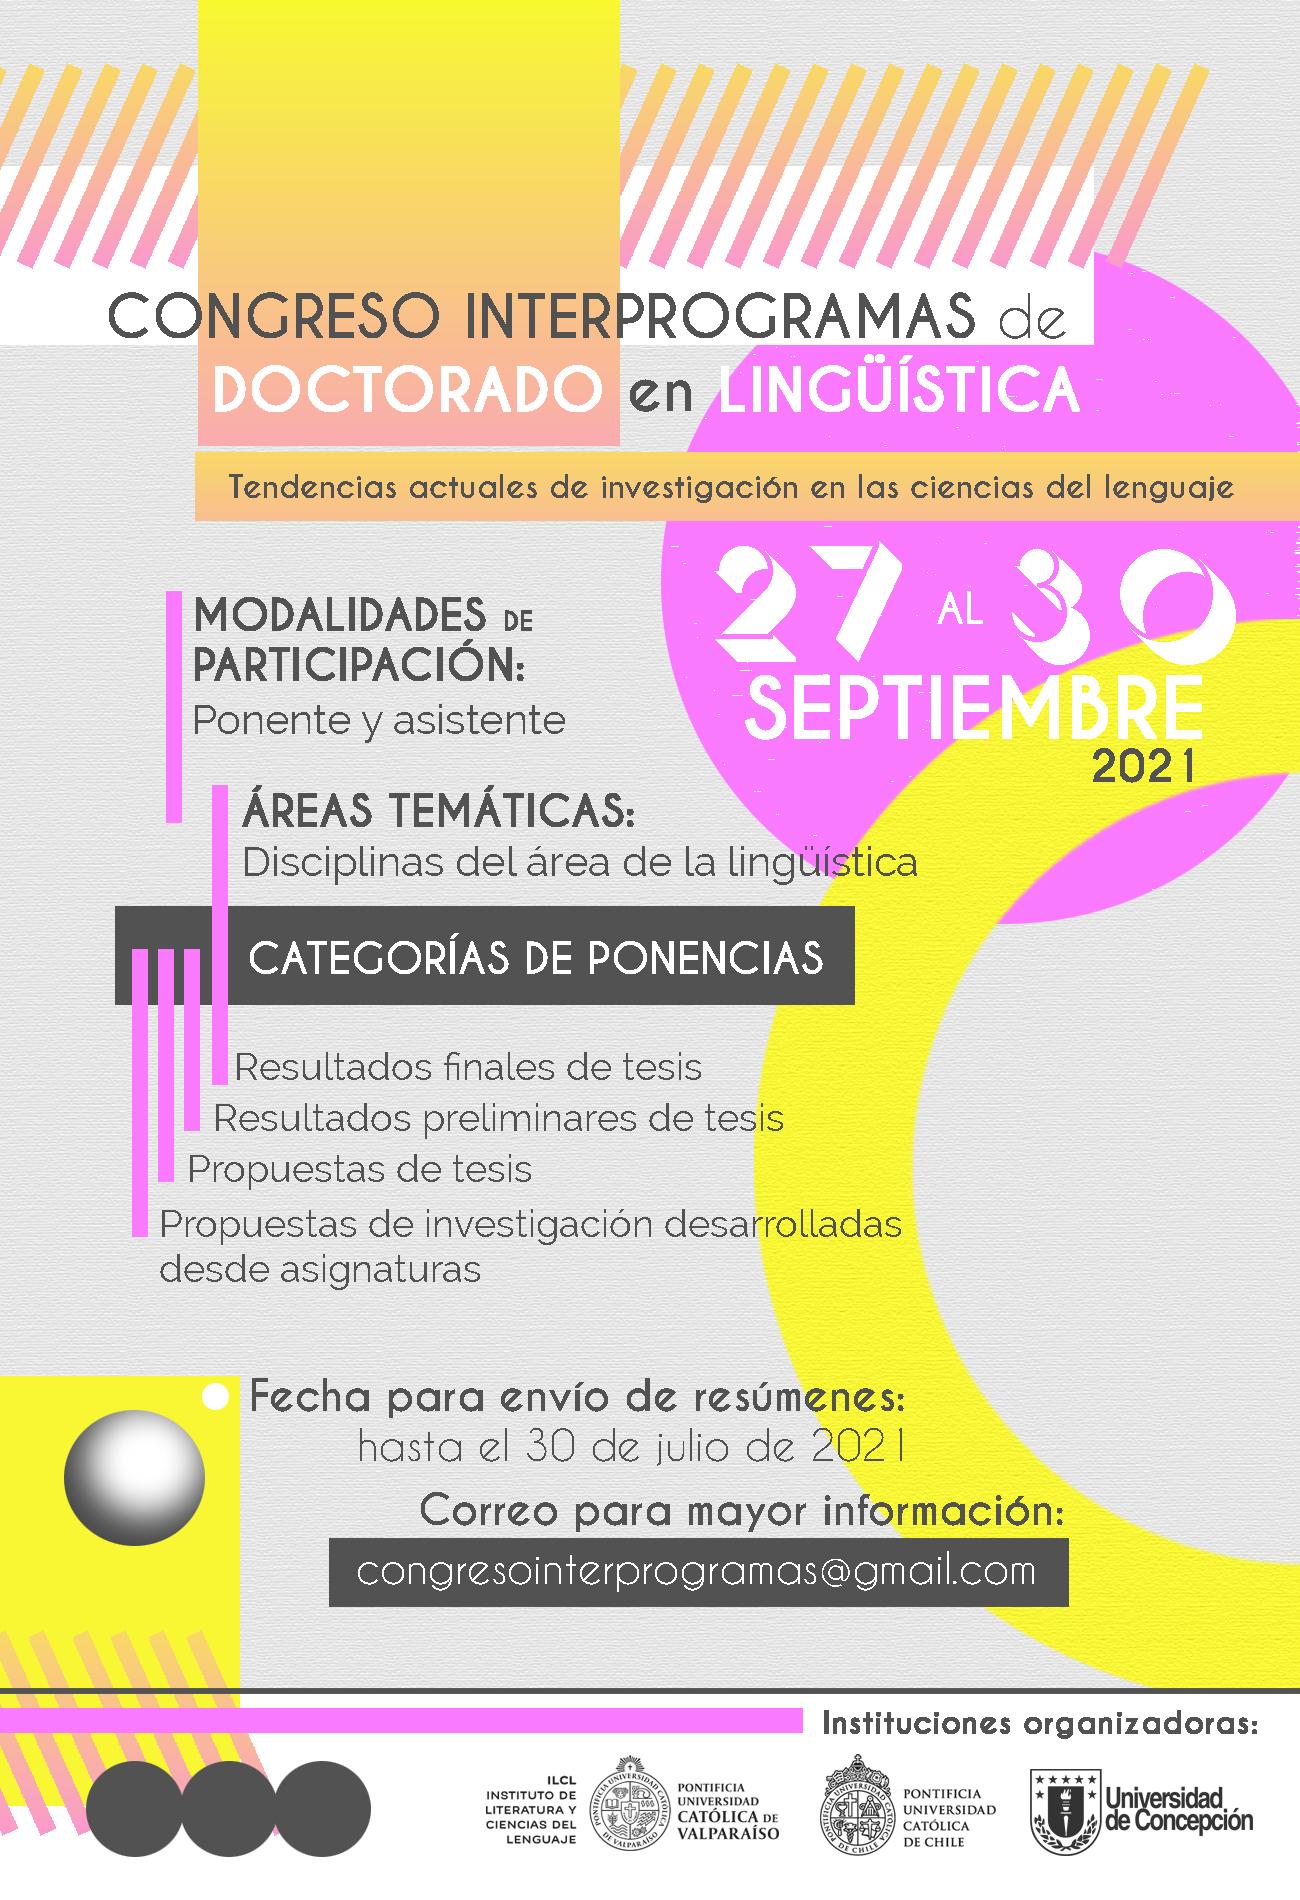 afiche-congreso-interprogramas